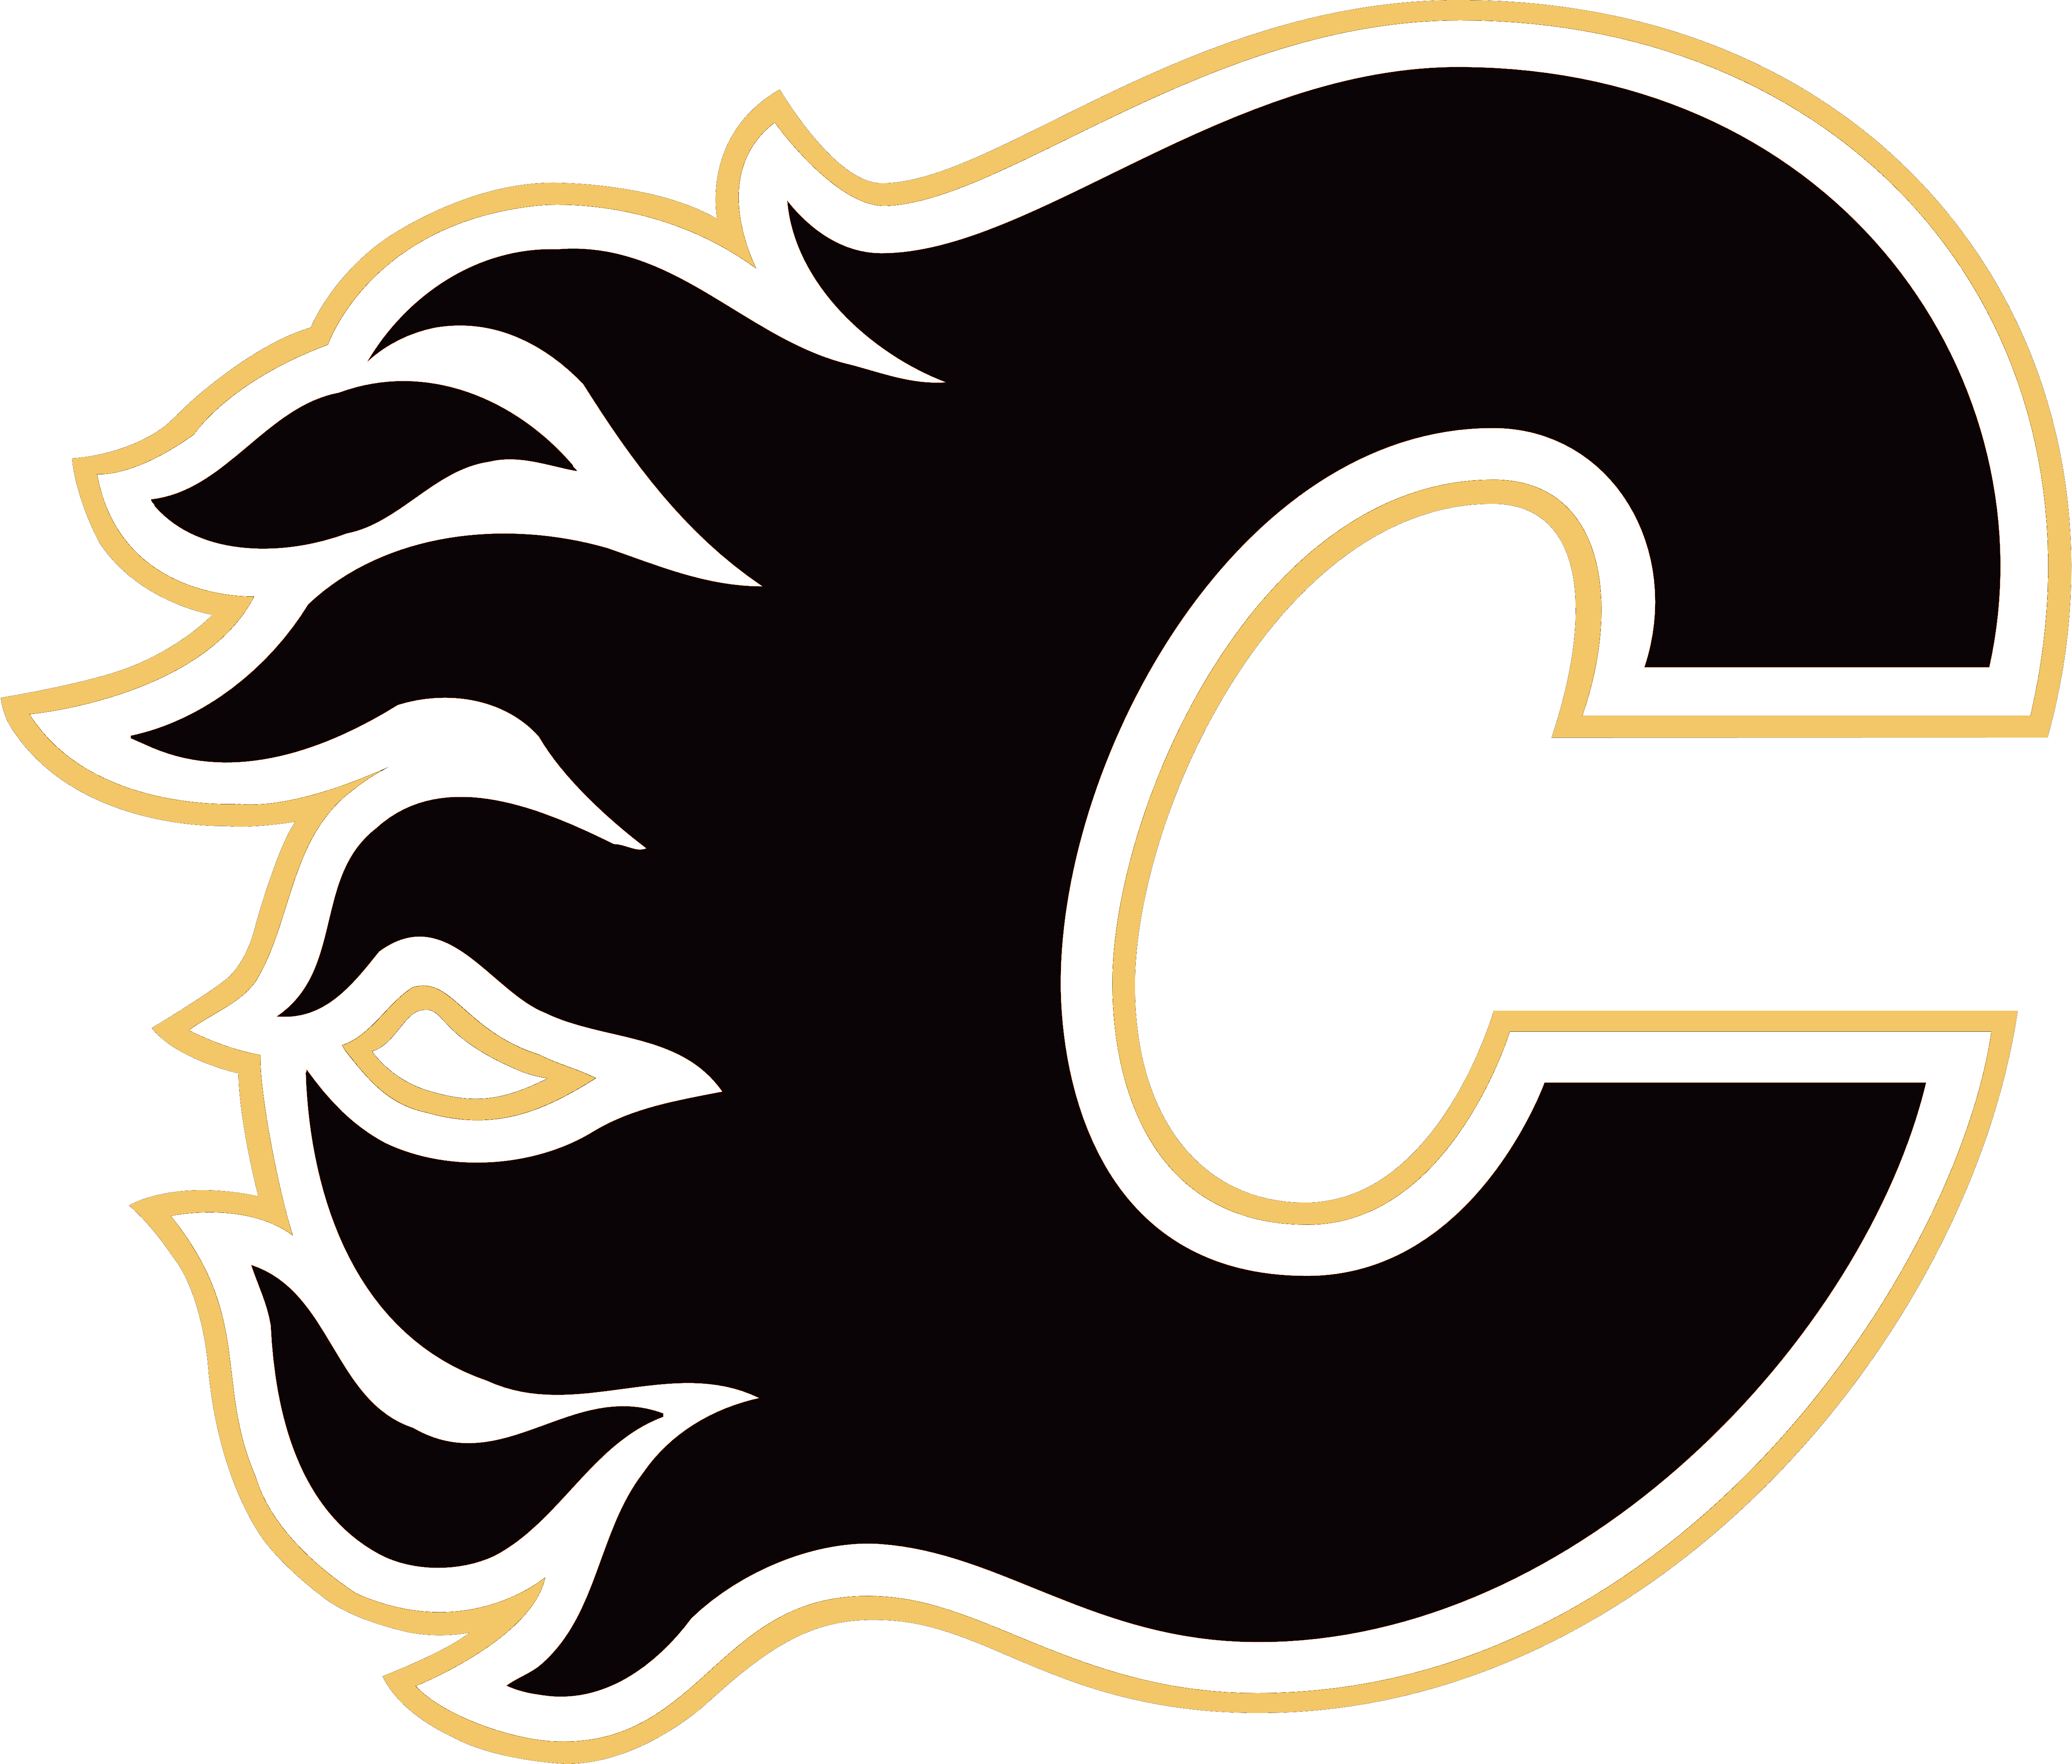 Car flames clipart jpg transparent Calgary Flames – Logos Download jpg transparent